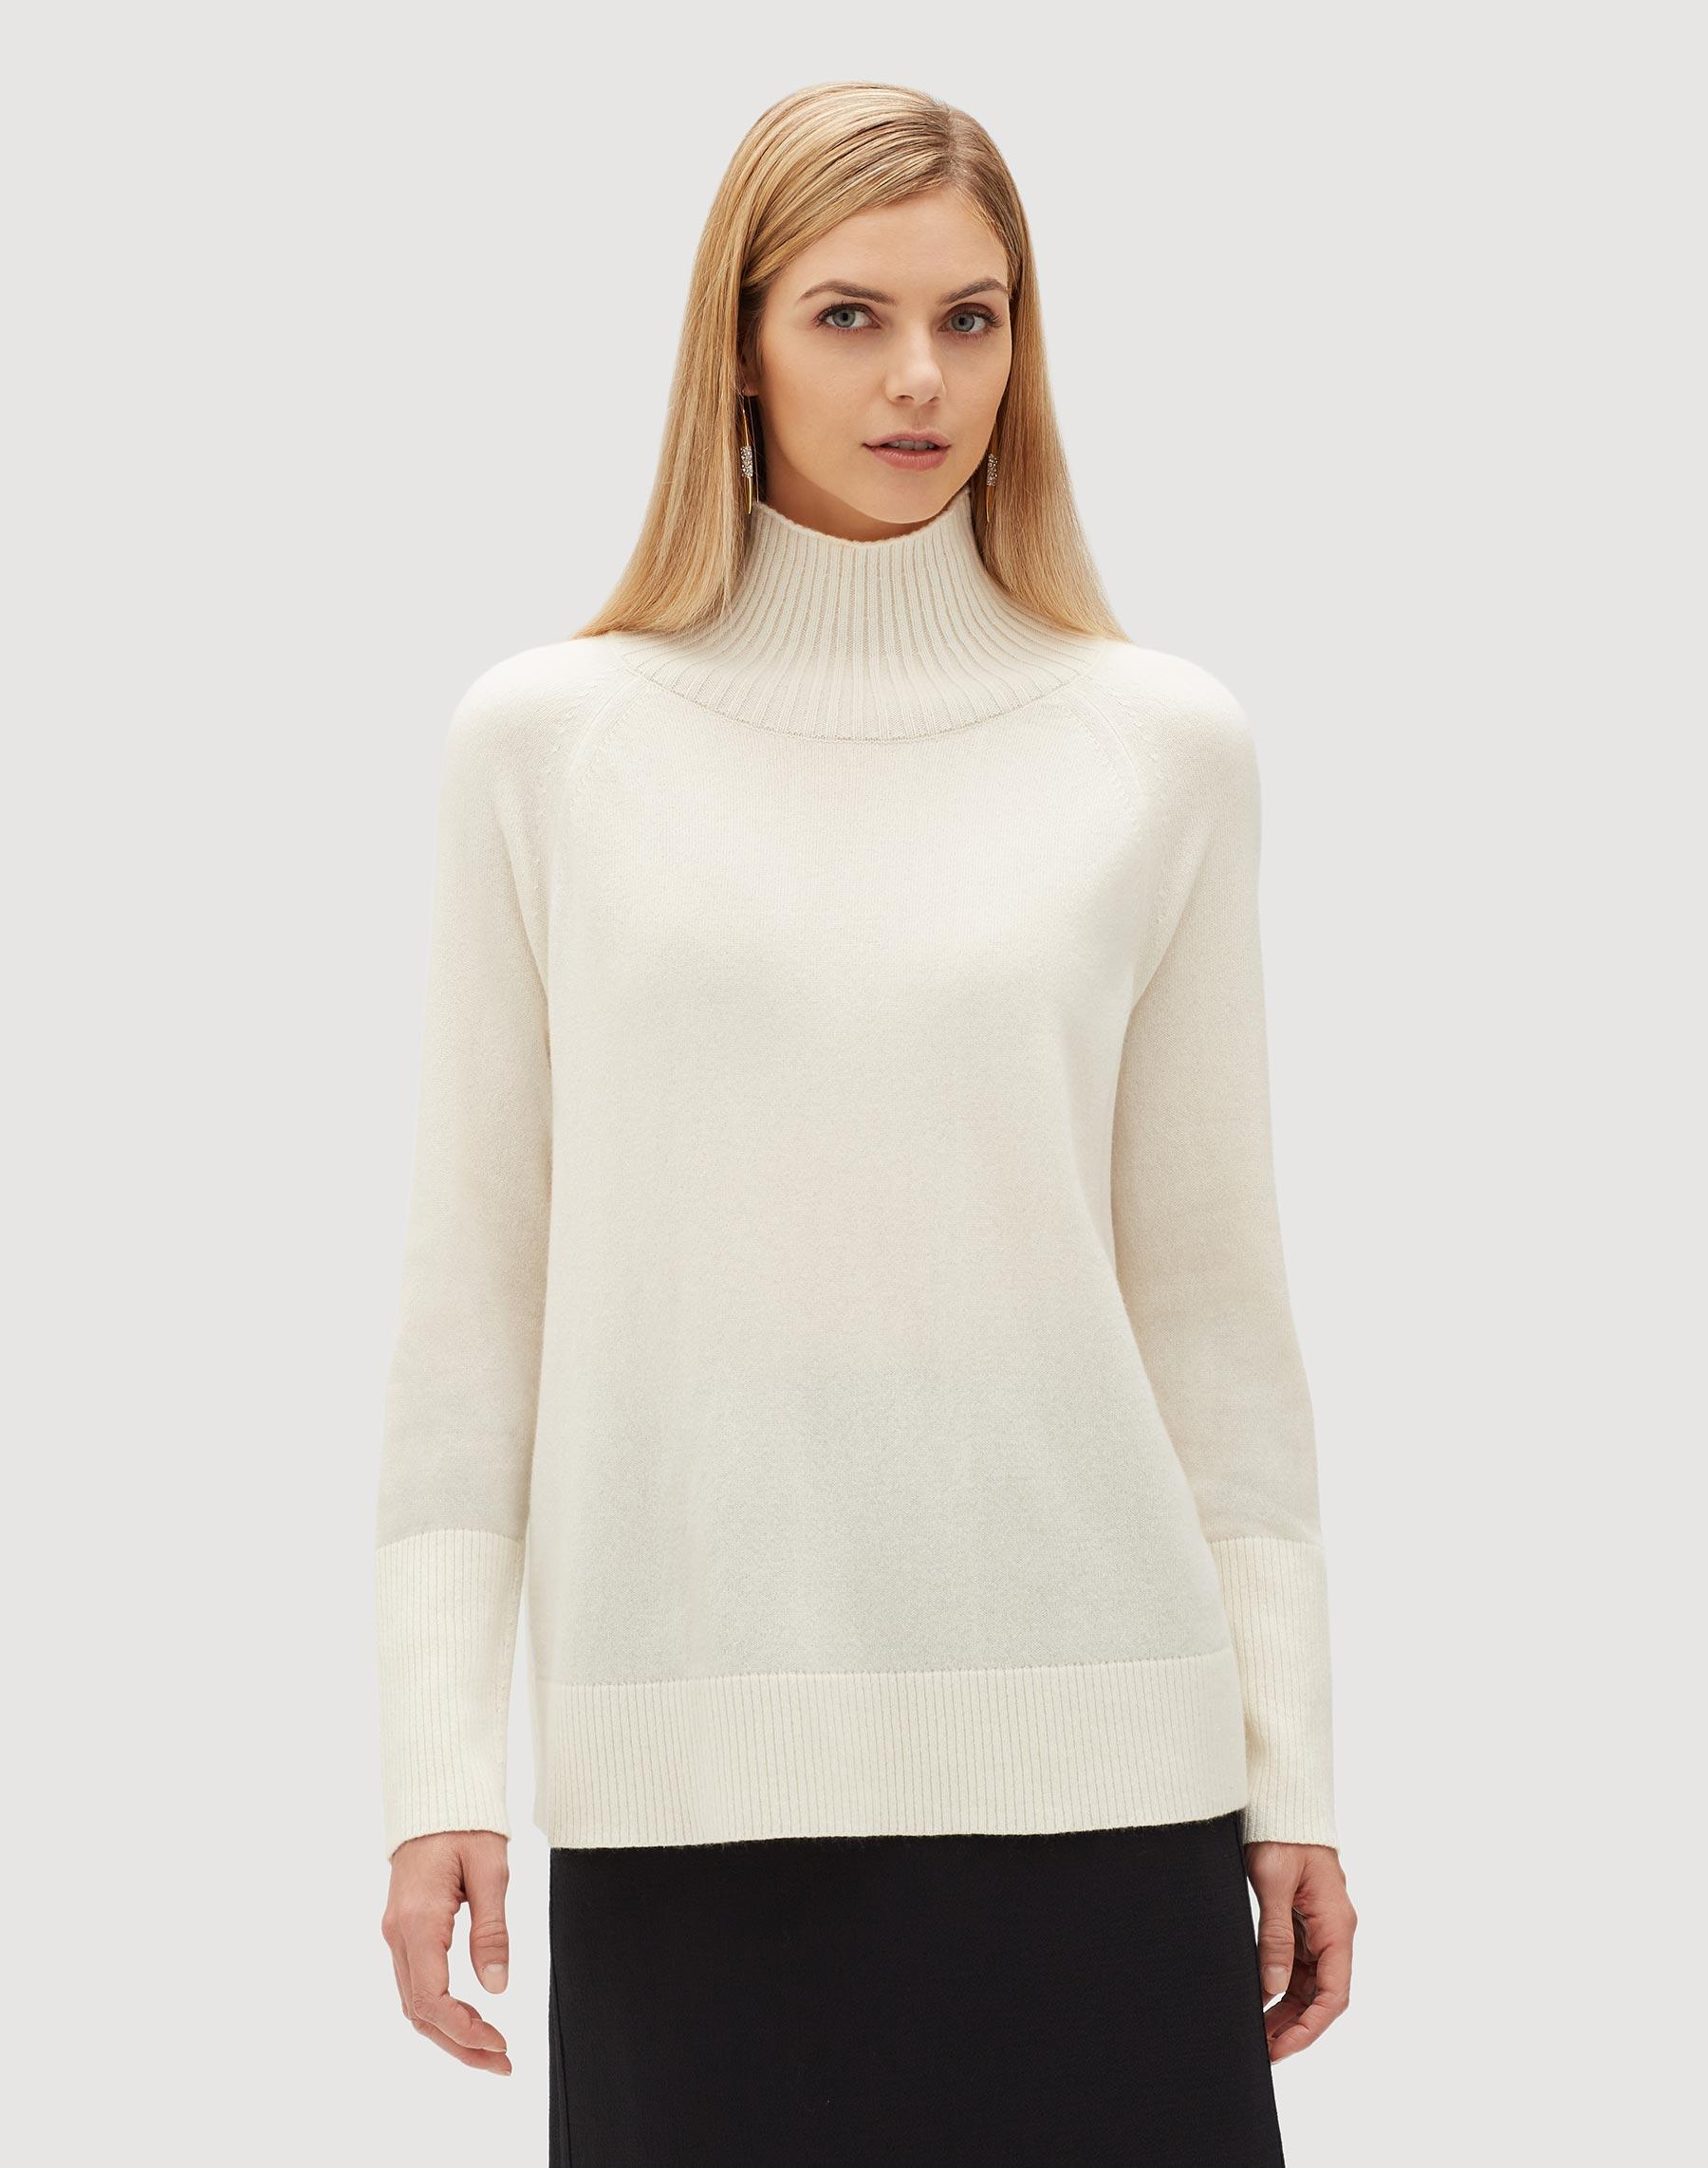 Plus Size Cashmere Side Zip Sweater Lafayette 148 New York